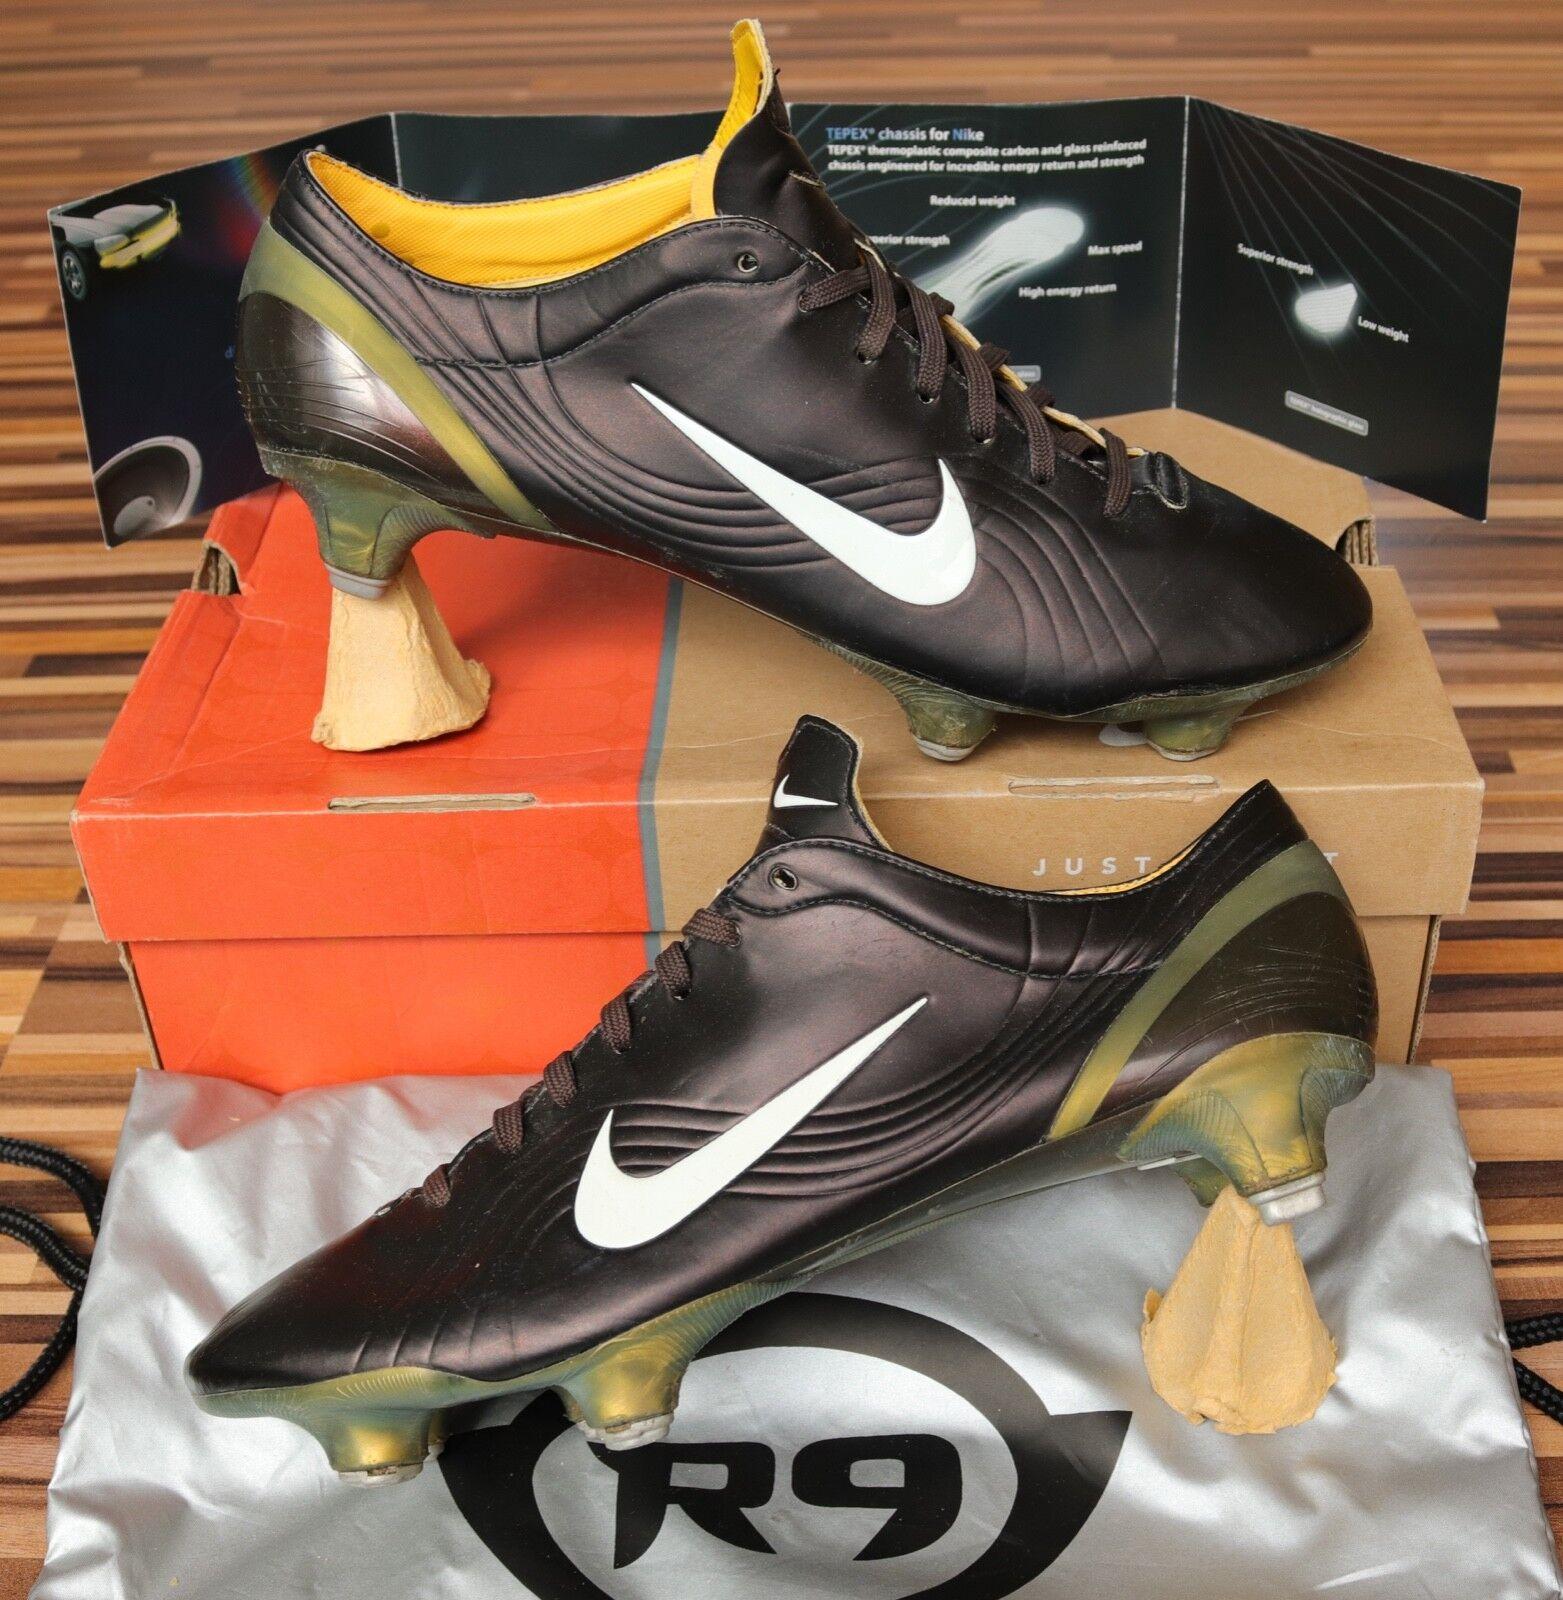 Nike mercurial vapor i sg 44 us10 uk9 r9 botas de fútbol Superfly XI sl XII Elite